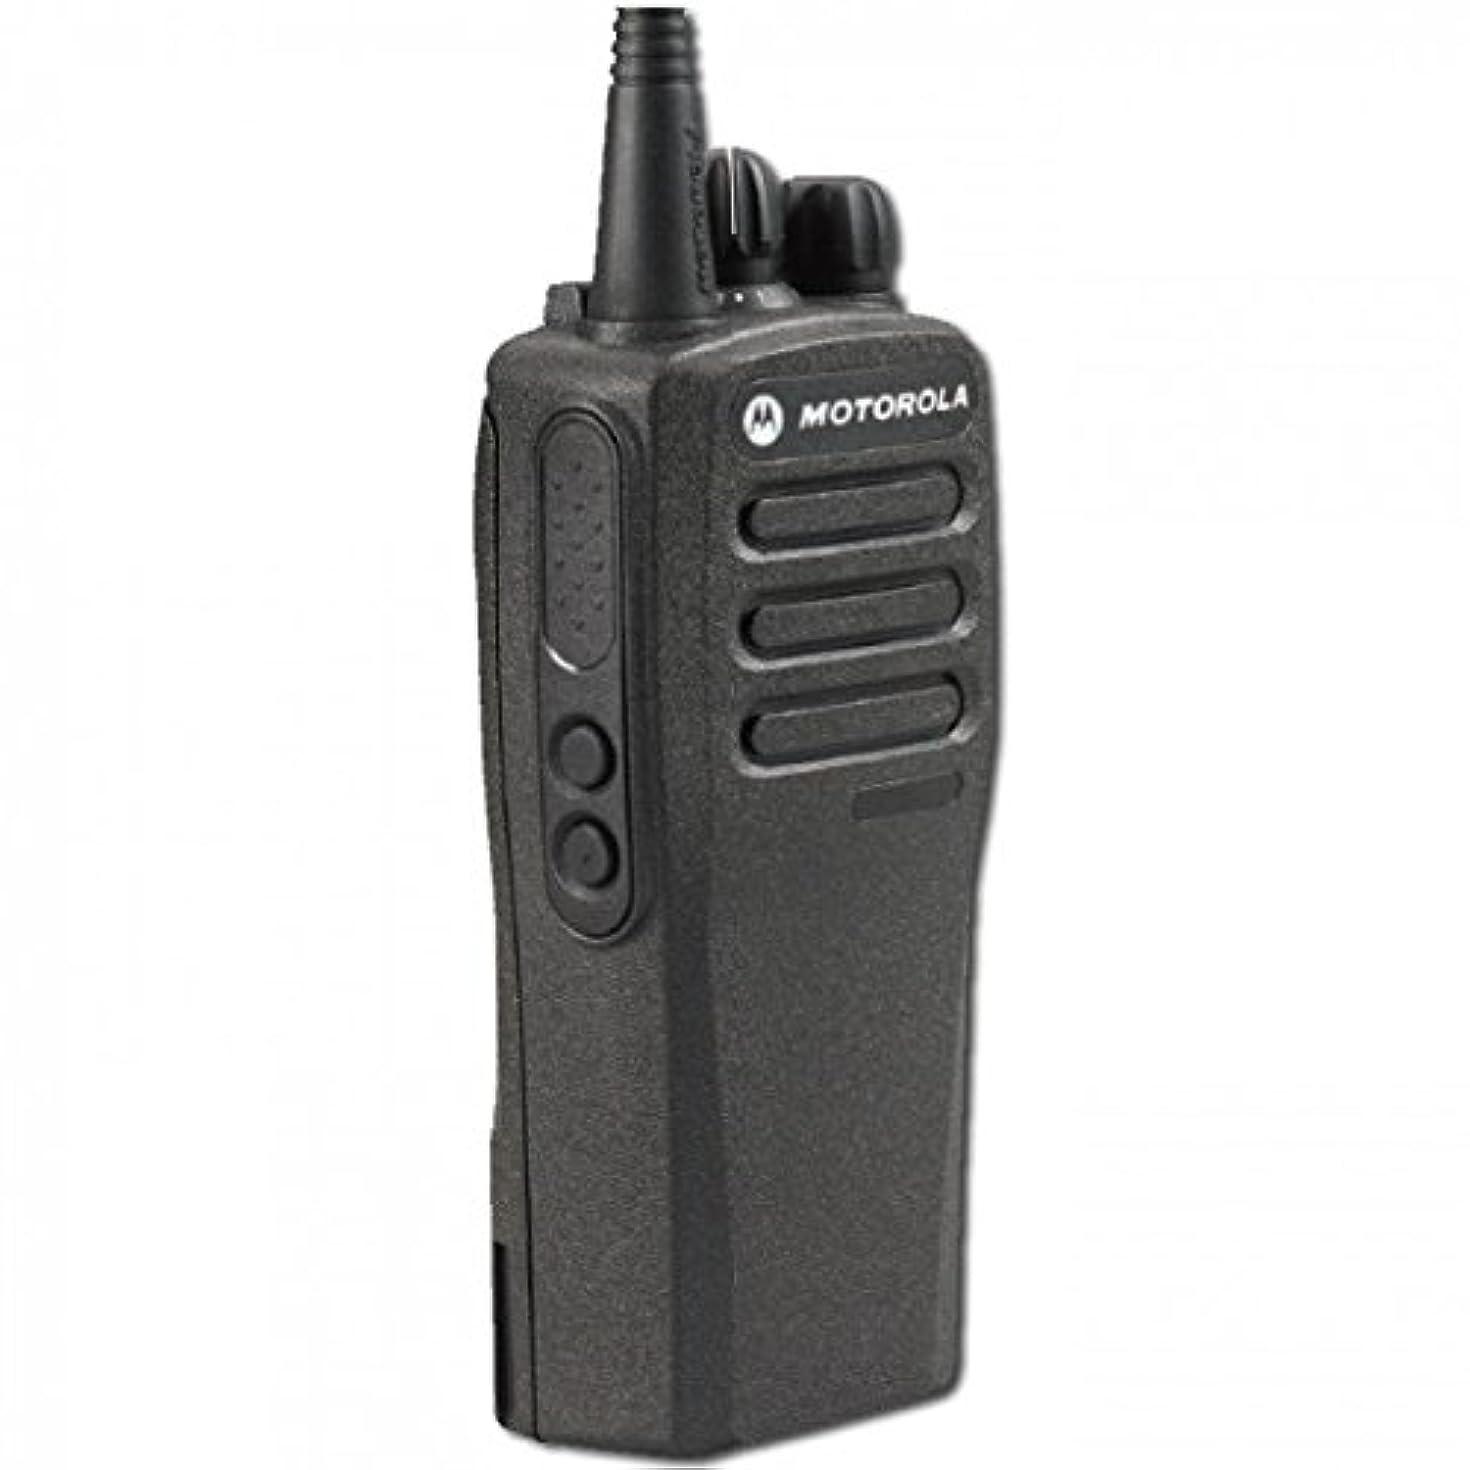 CP200D AAH01QDC9JC2AN Original Motorola Analog & Digital UHF 403-470 MHz Portable Two-way Radio 16 Channels, 4 Watts - Original Package - 2 Year Warranty …